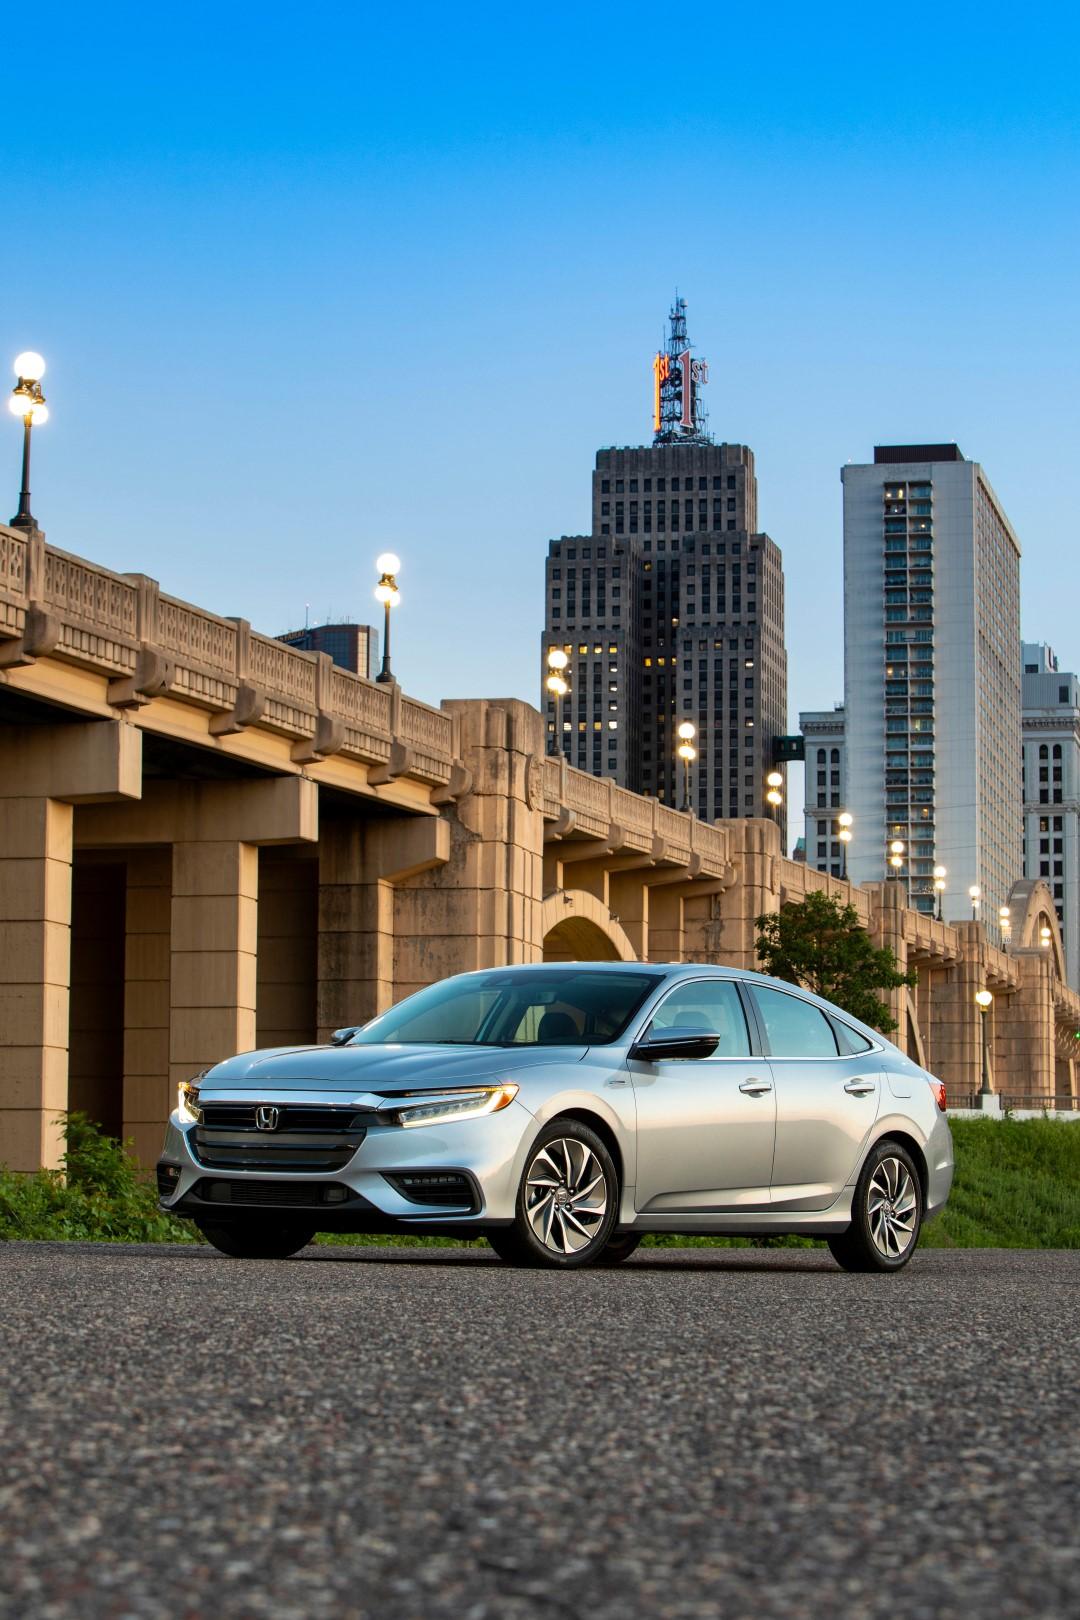 Honda Insight, disimulada apariencia y estupenda eficiencia